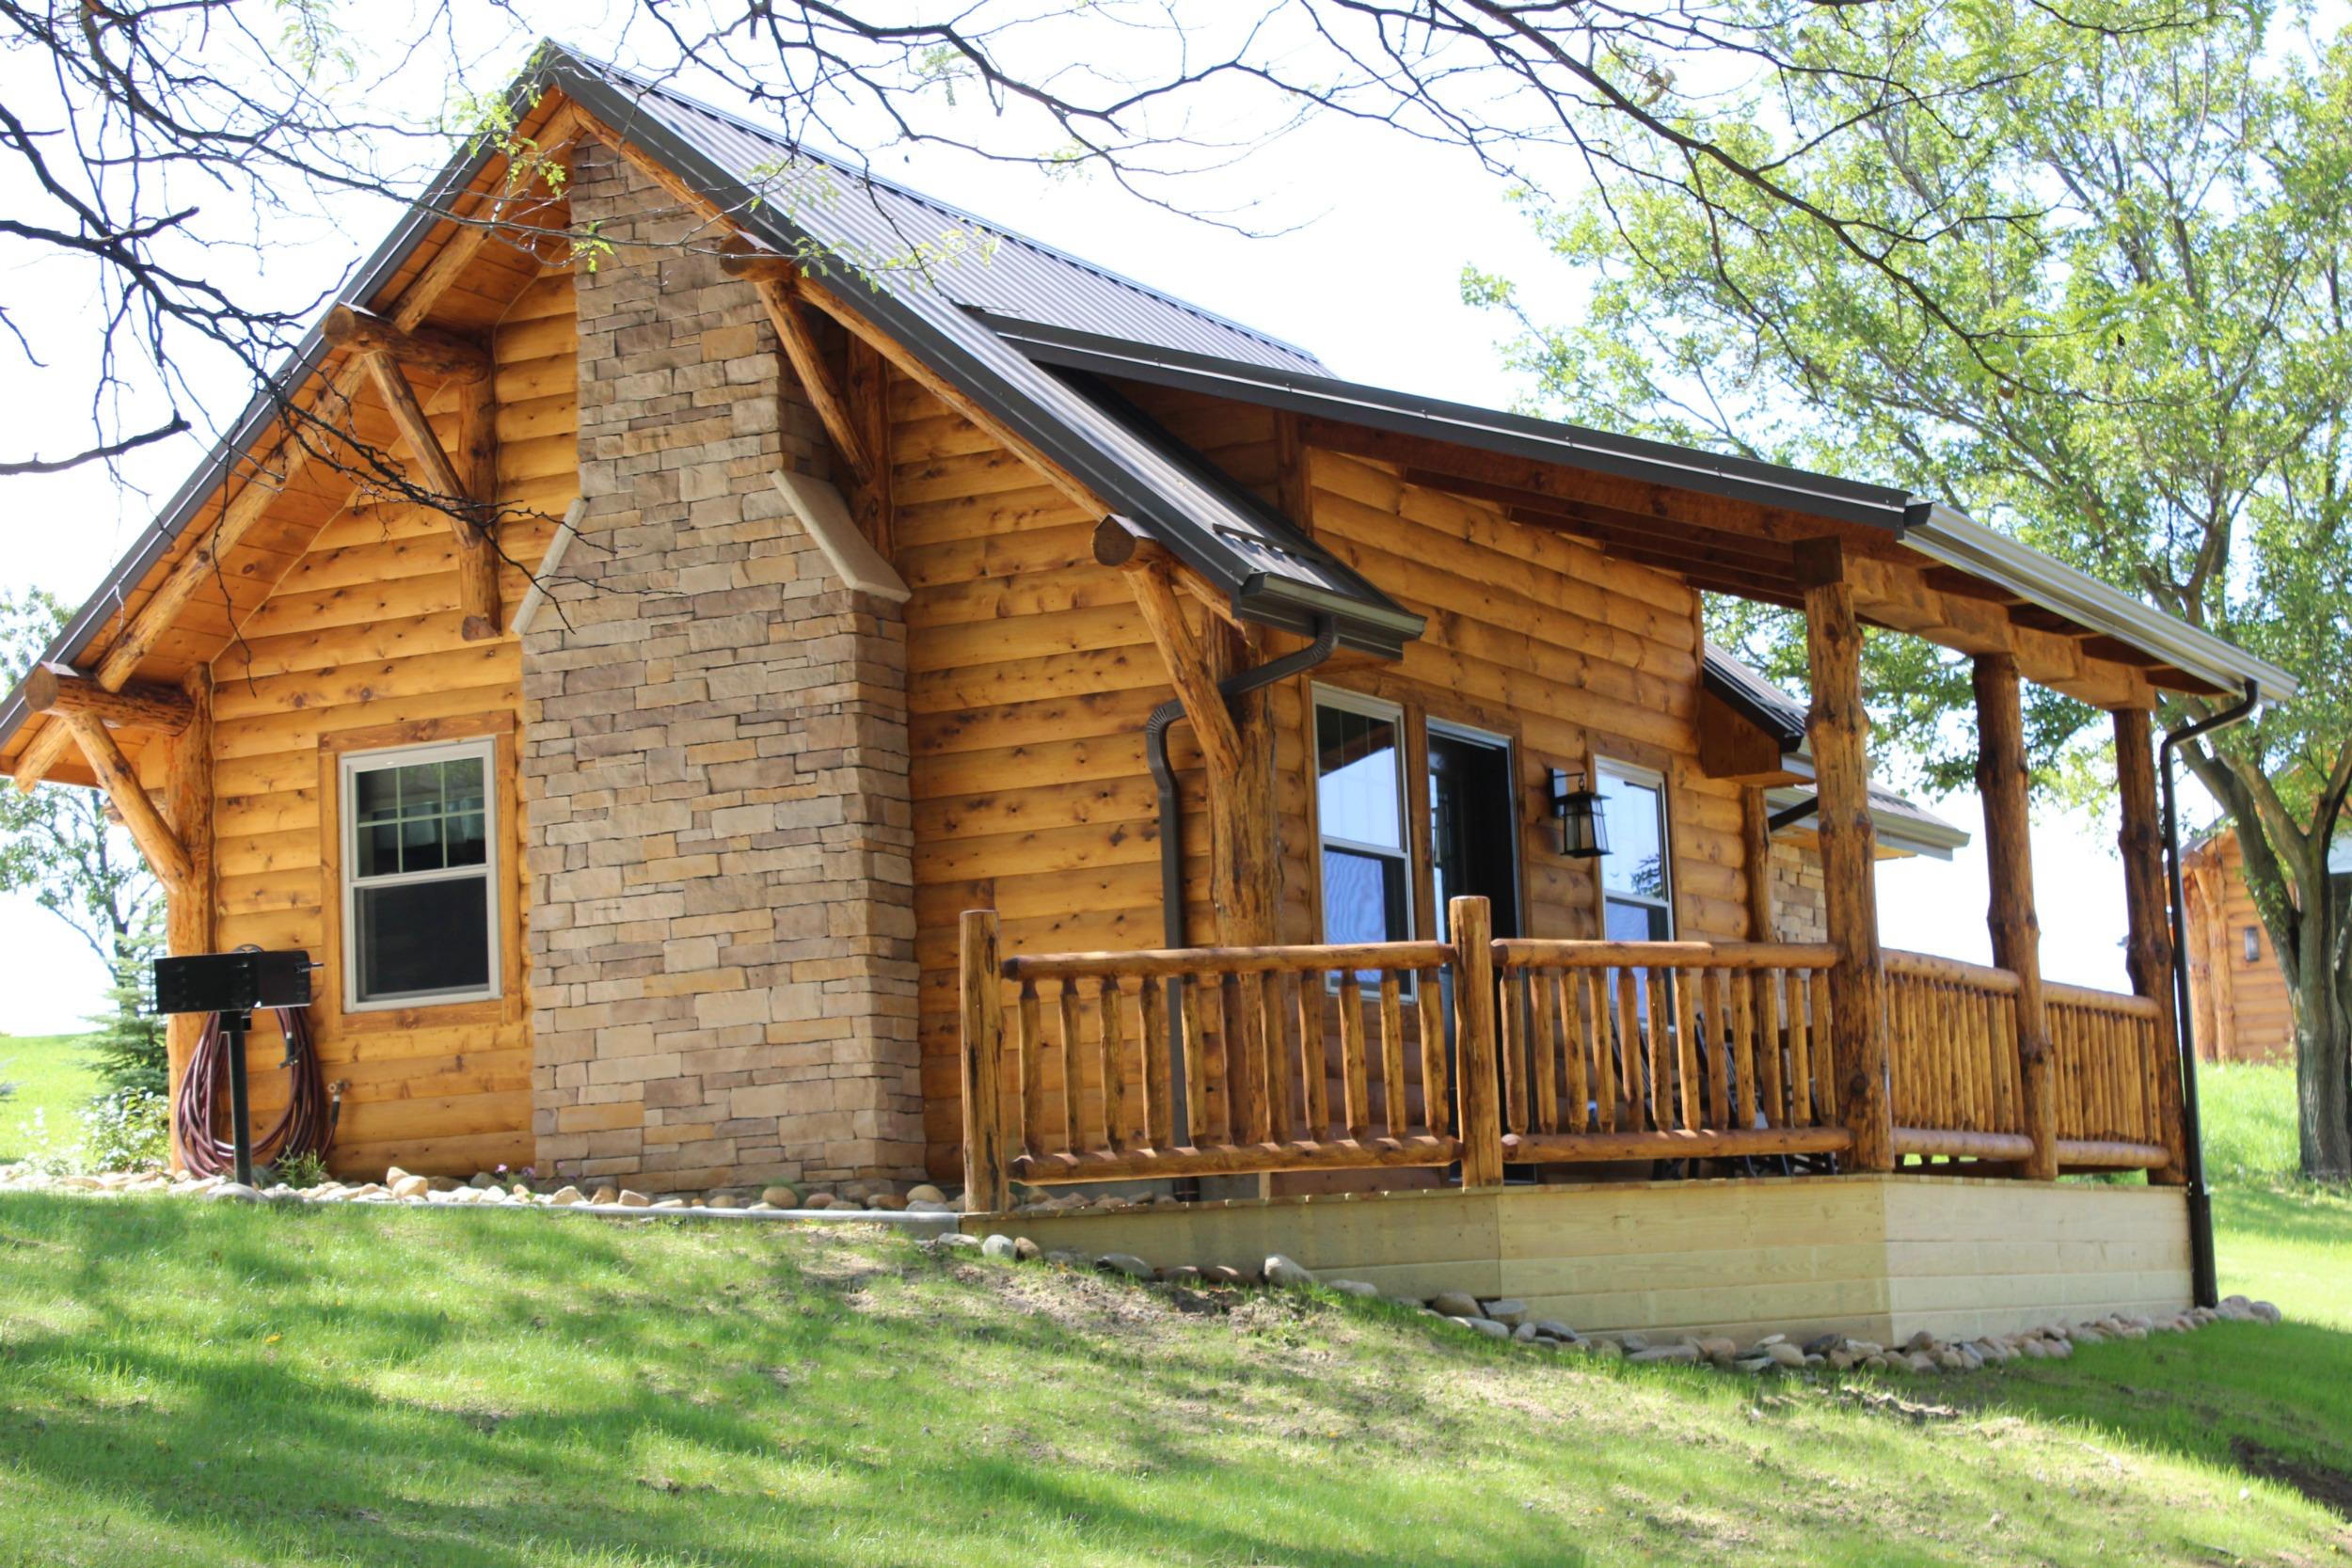 Coblentz Country Cabins